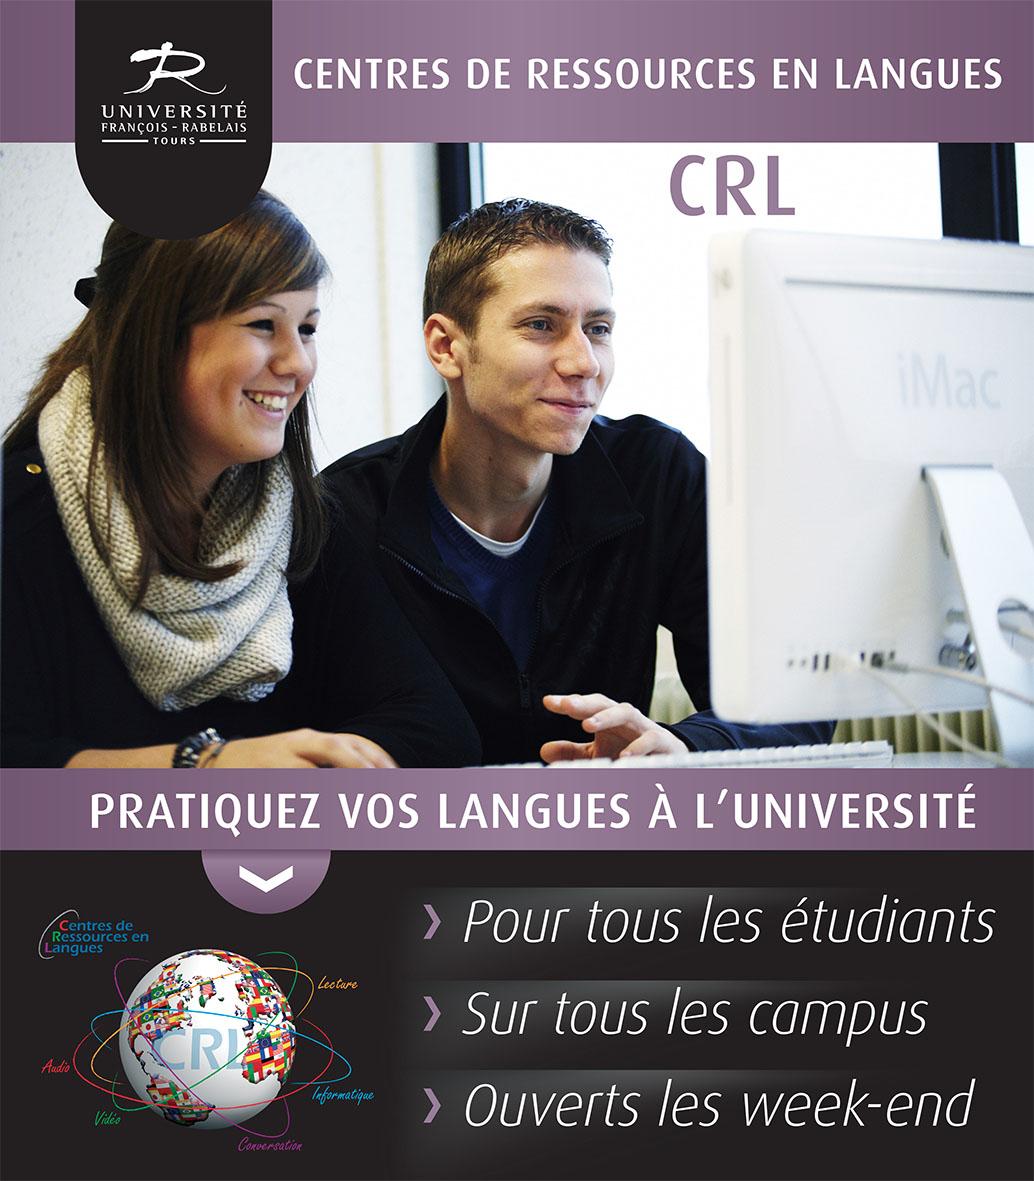 affiche CRL.jpg